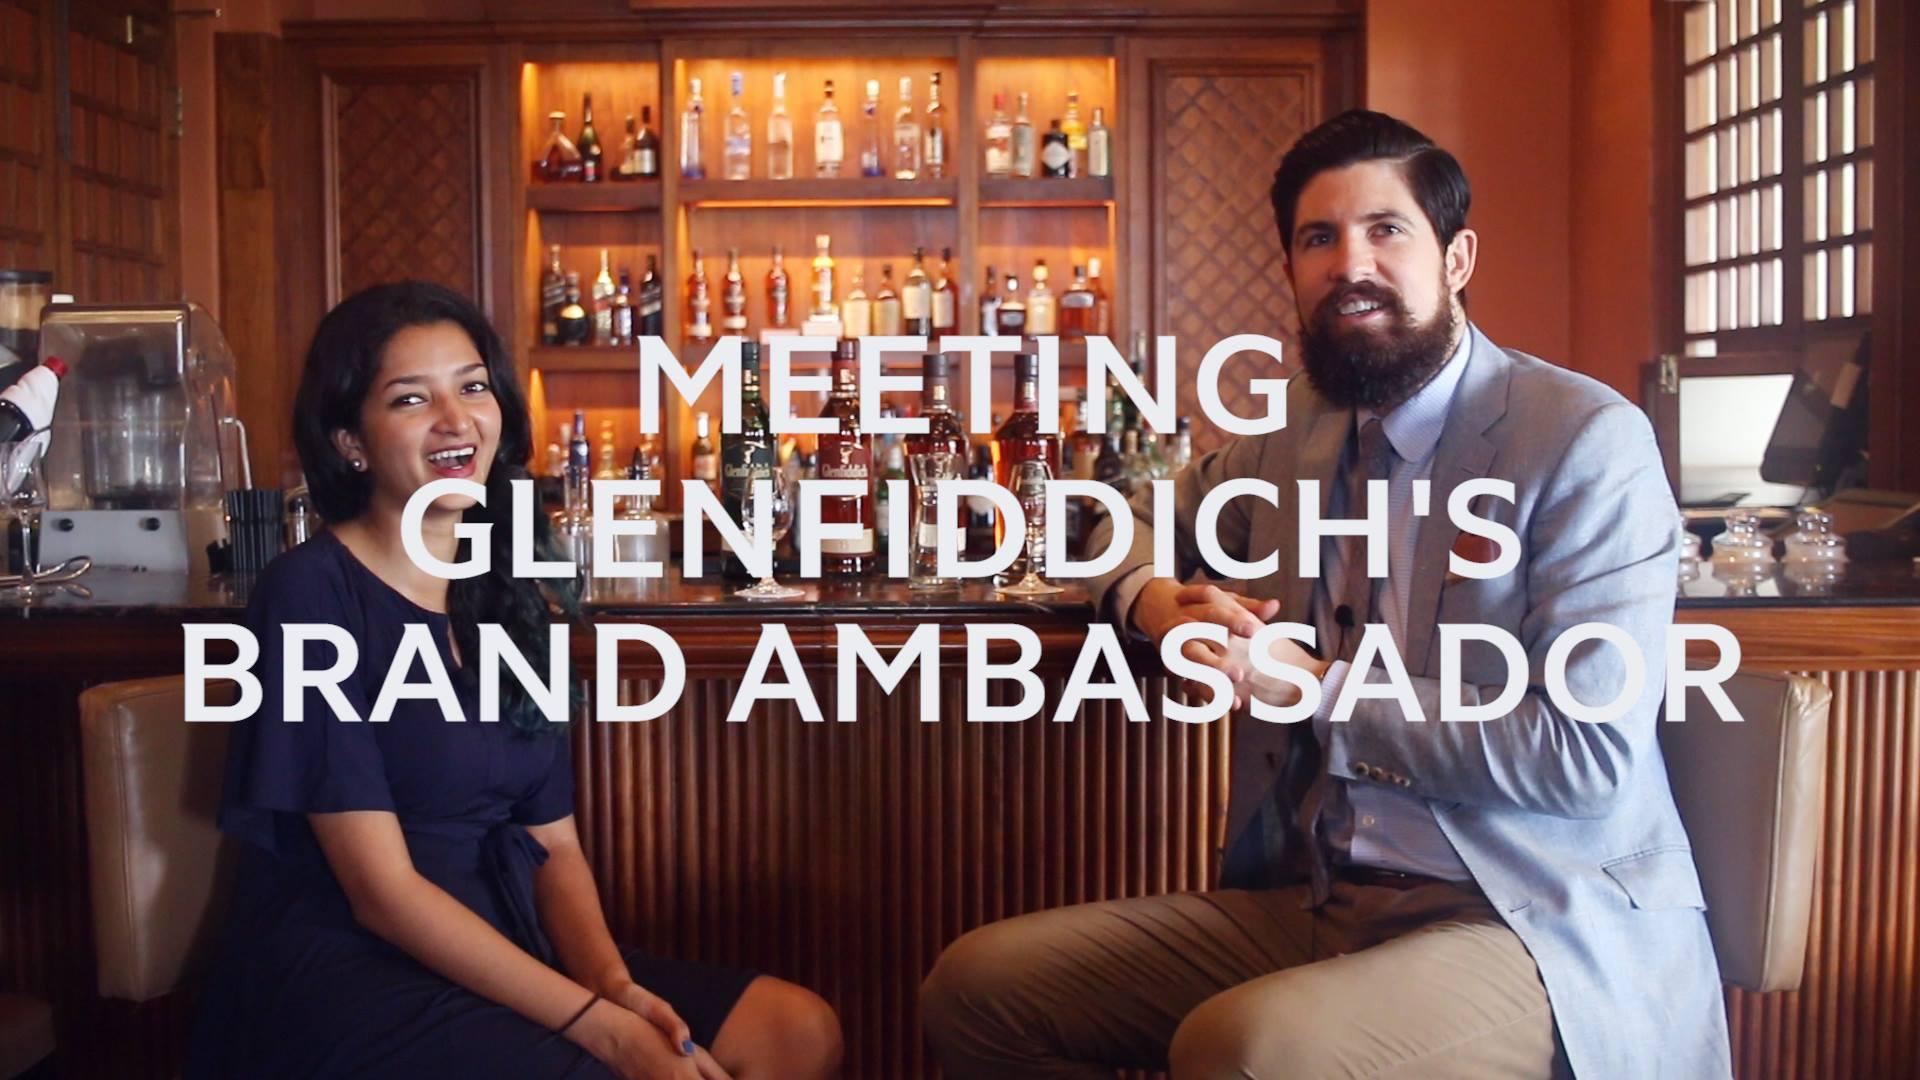 YAMU & Glenfiddich Global Brand Ambassador Discuss How to Drin...